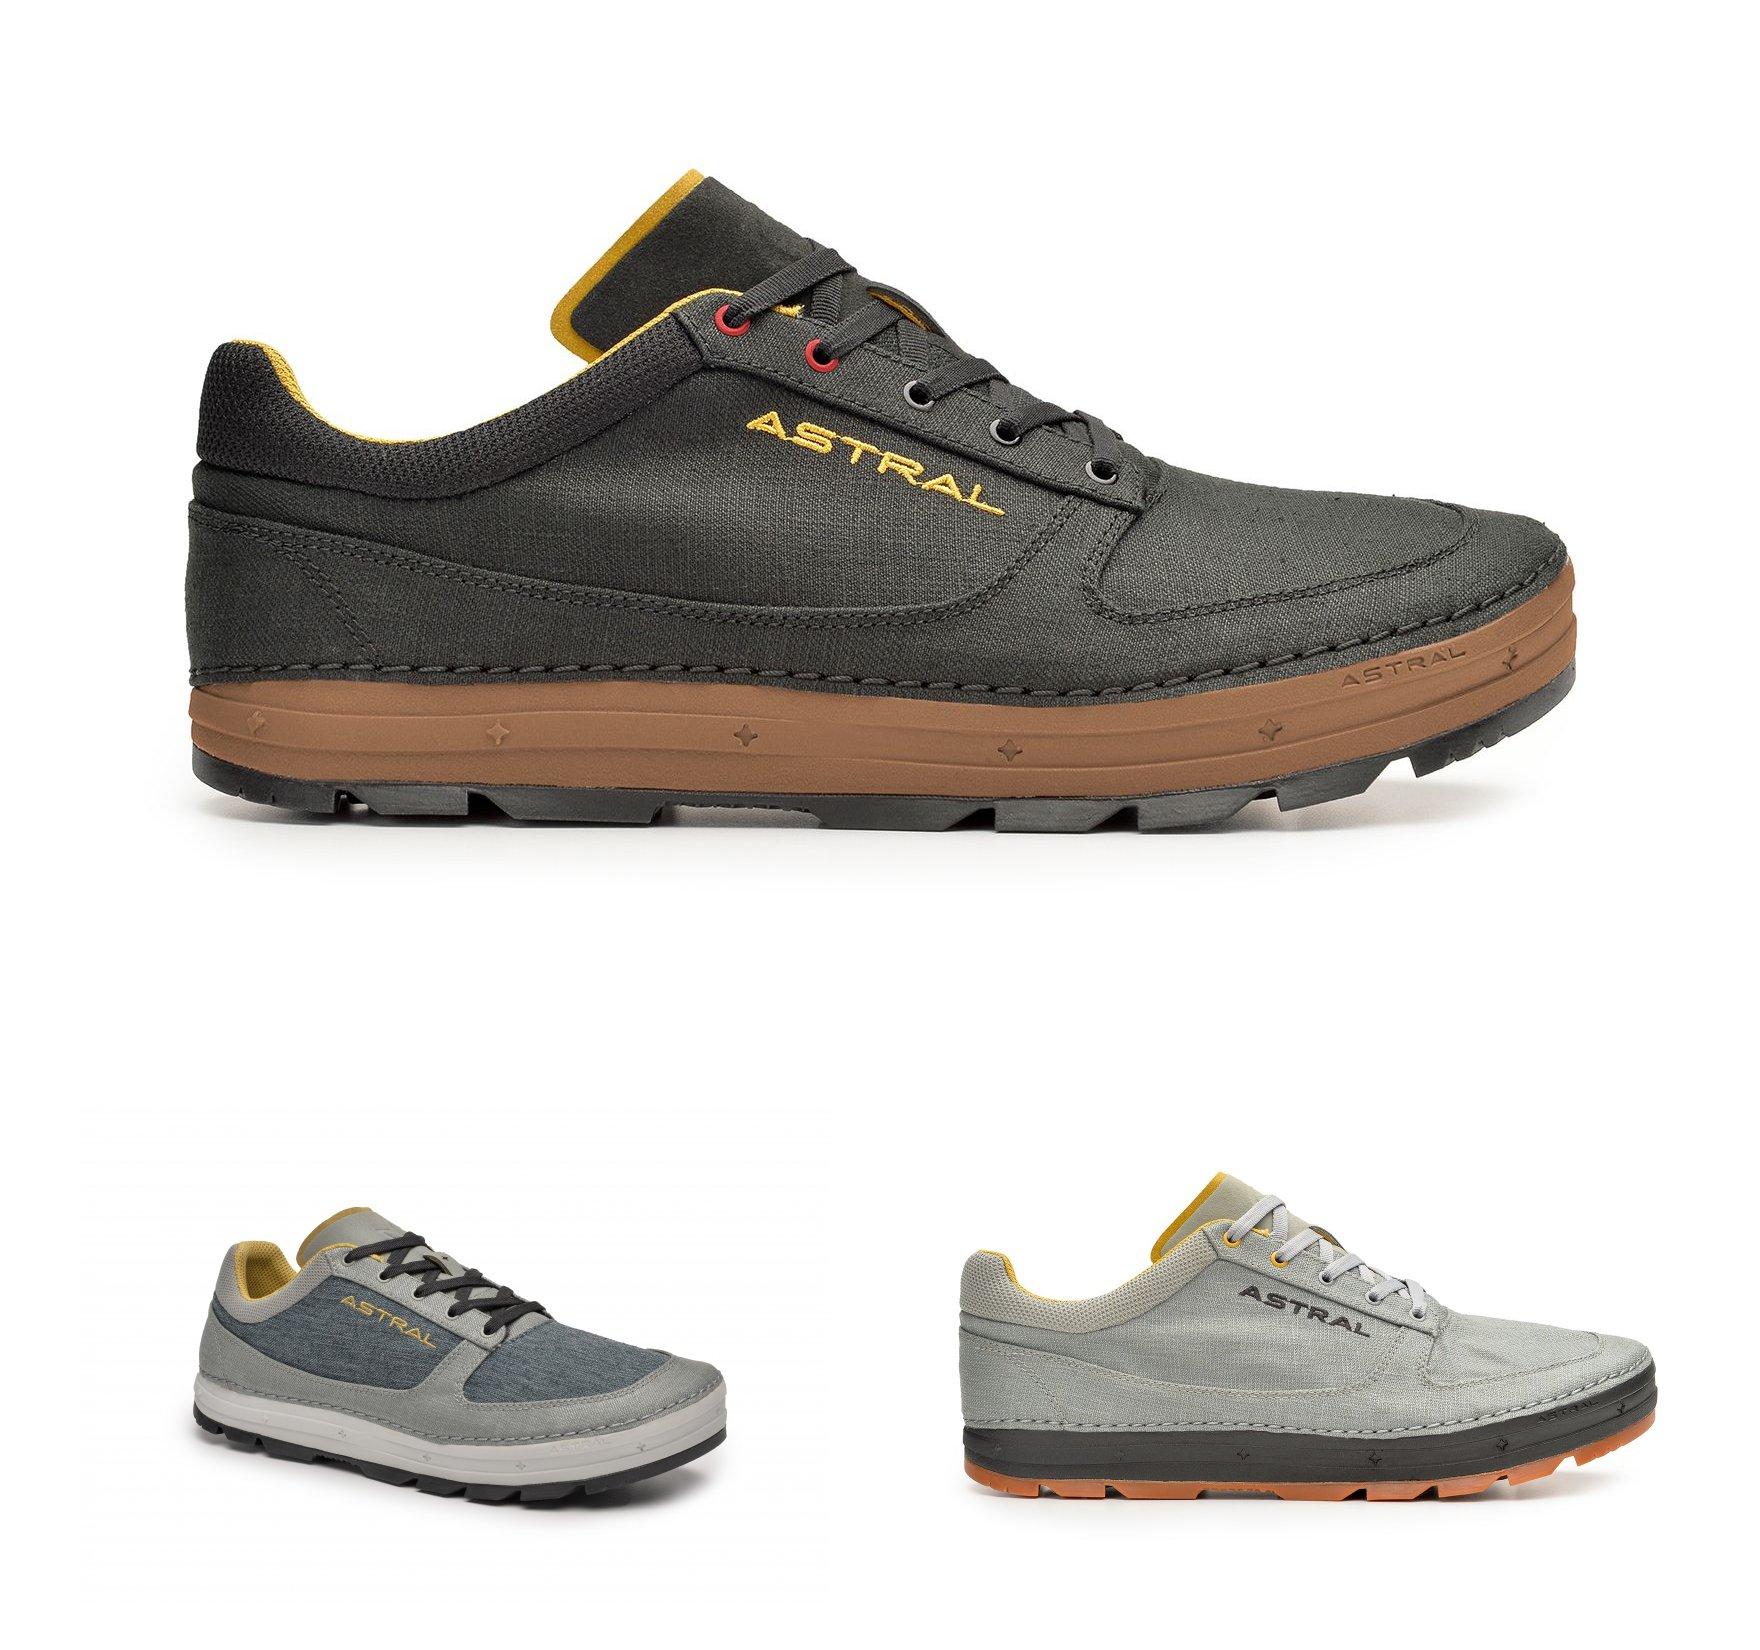 Astral Hemp Donner Hiking Shoes Men's